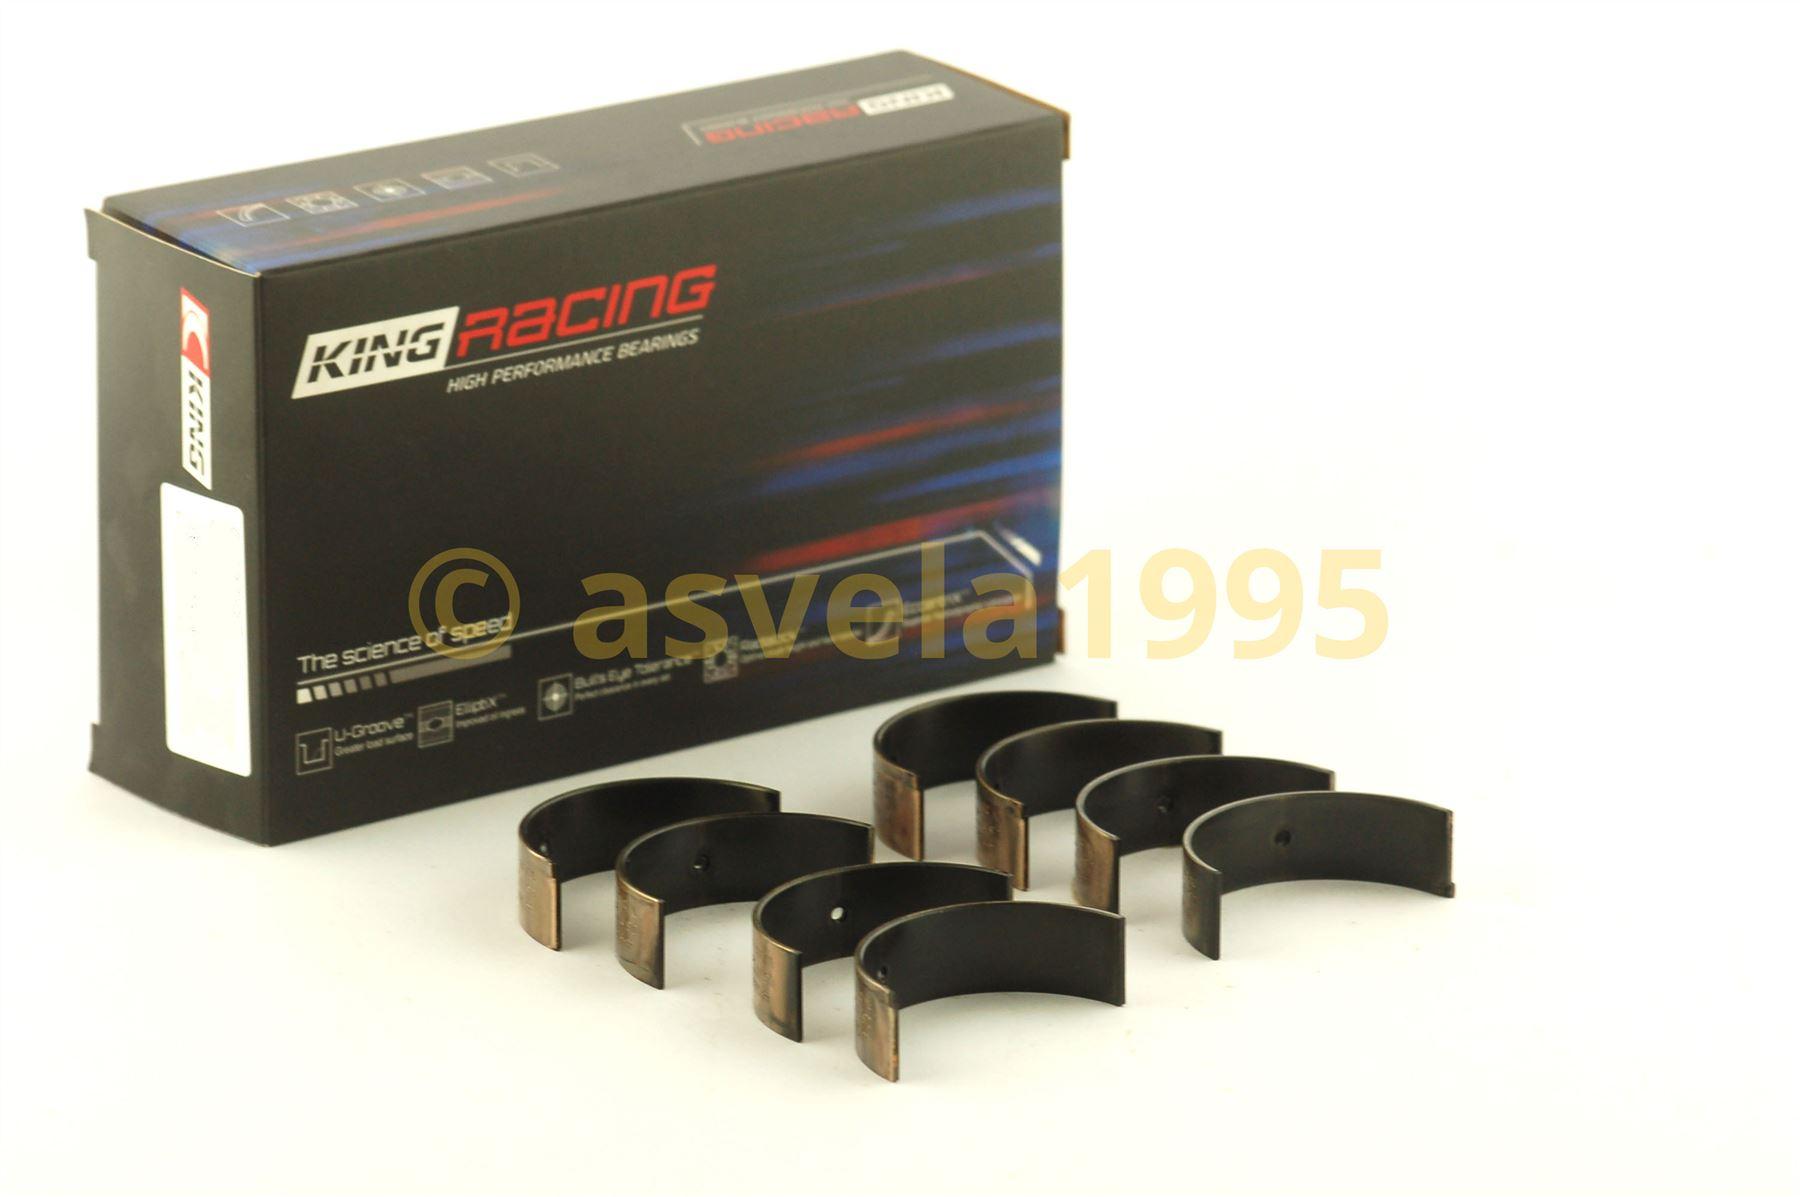 King Bearings CR4065XP0.25 Nissan KA-24DE Performance Rod Bearing Set Size 0.25 Oversized